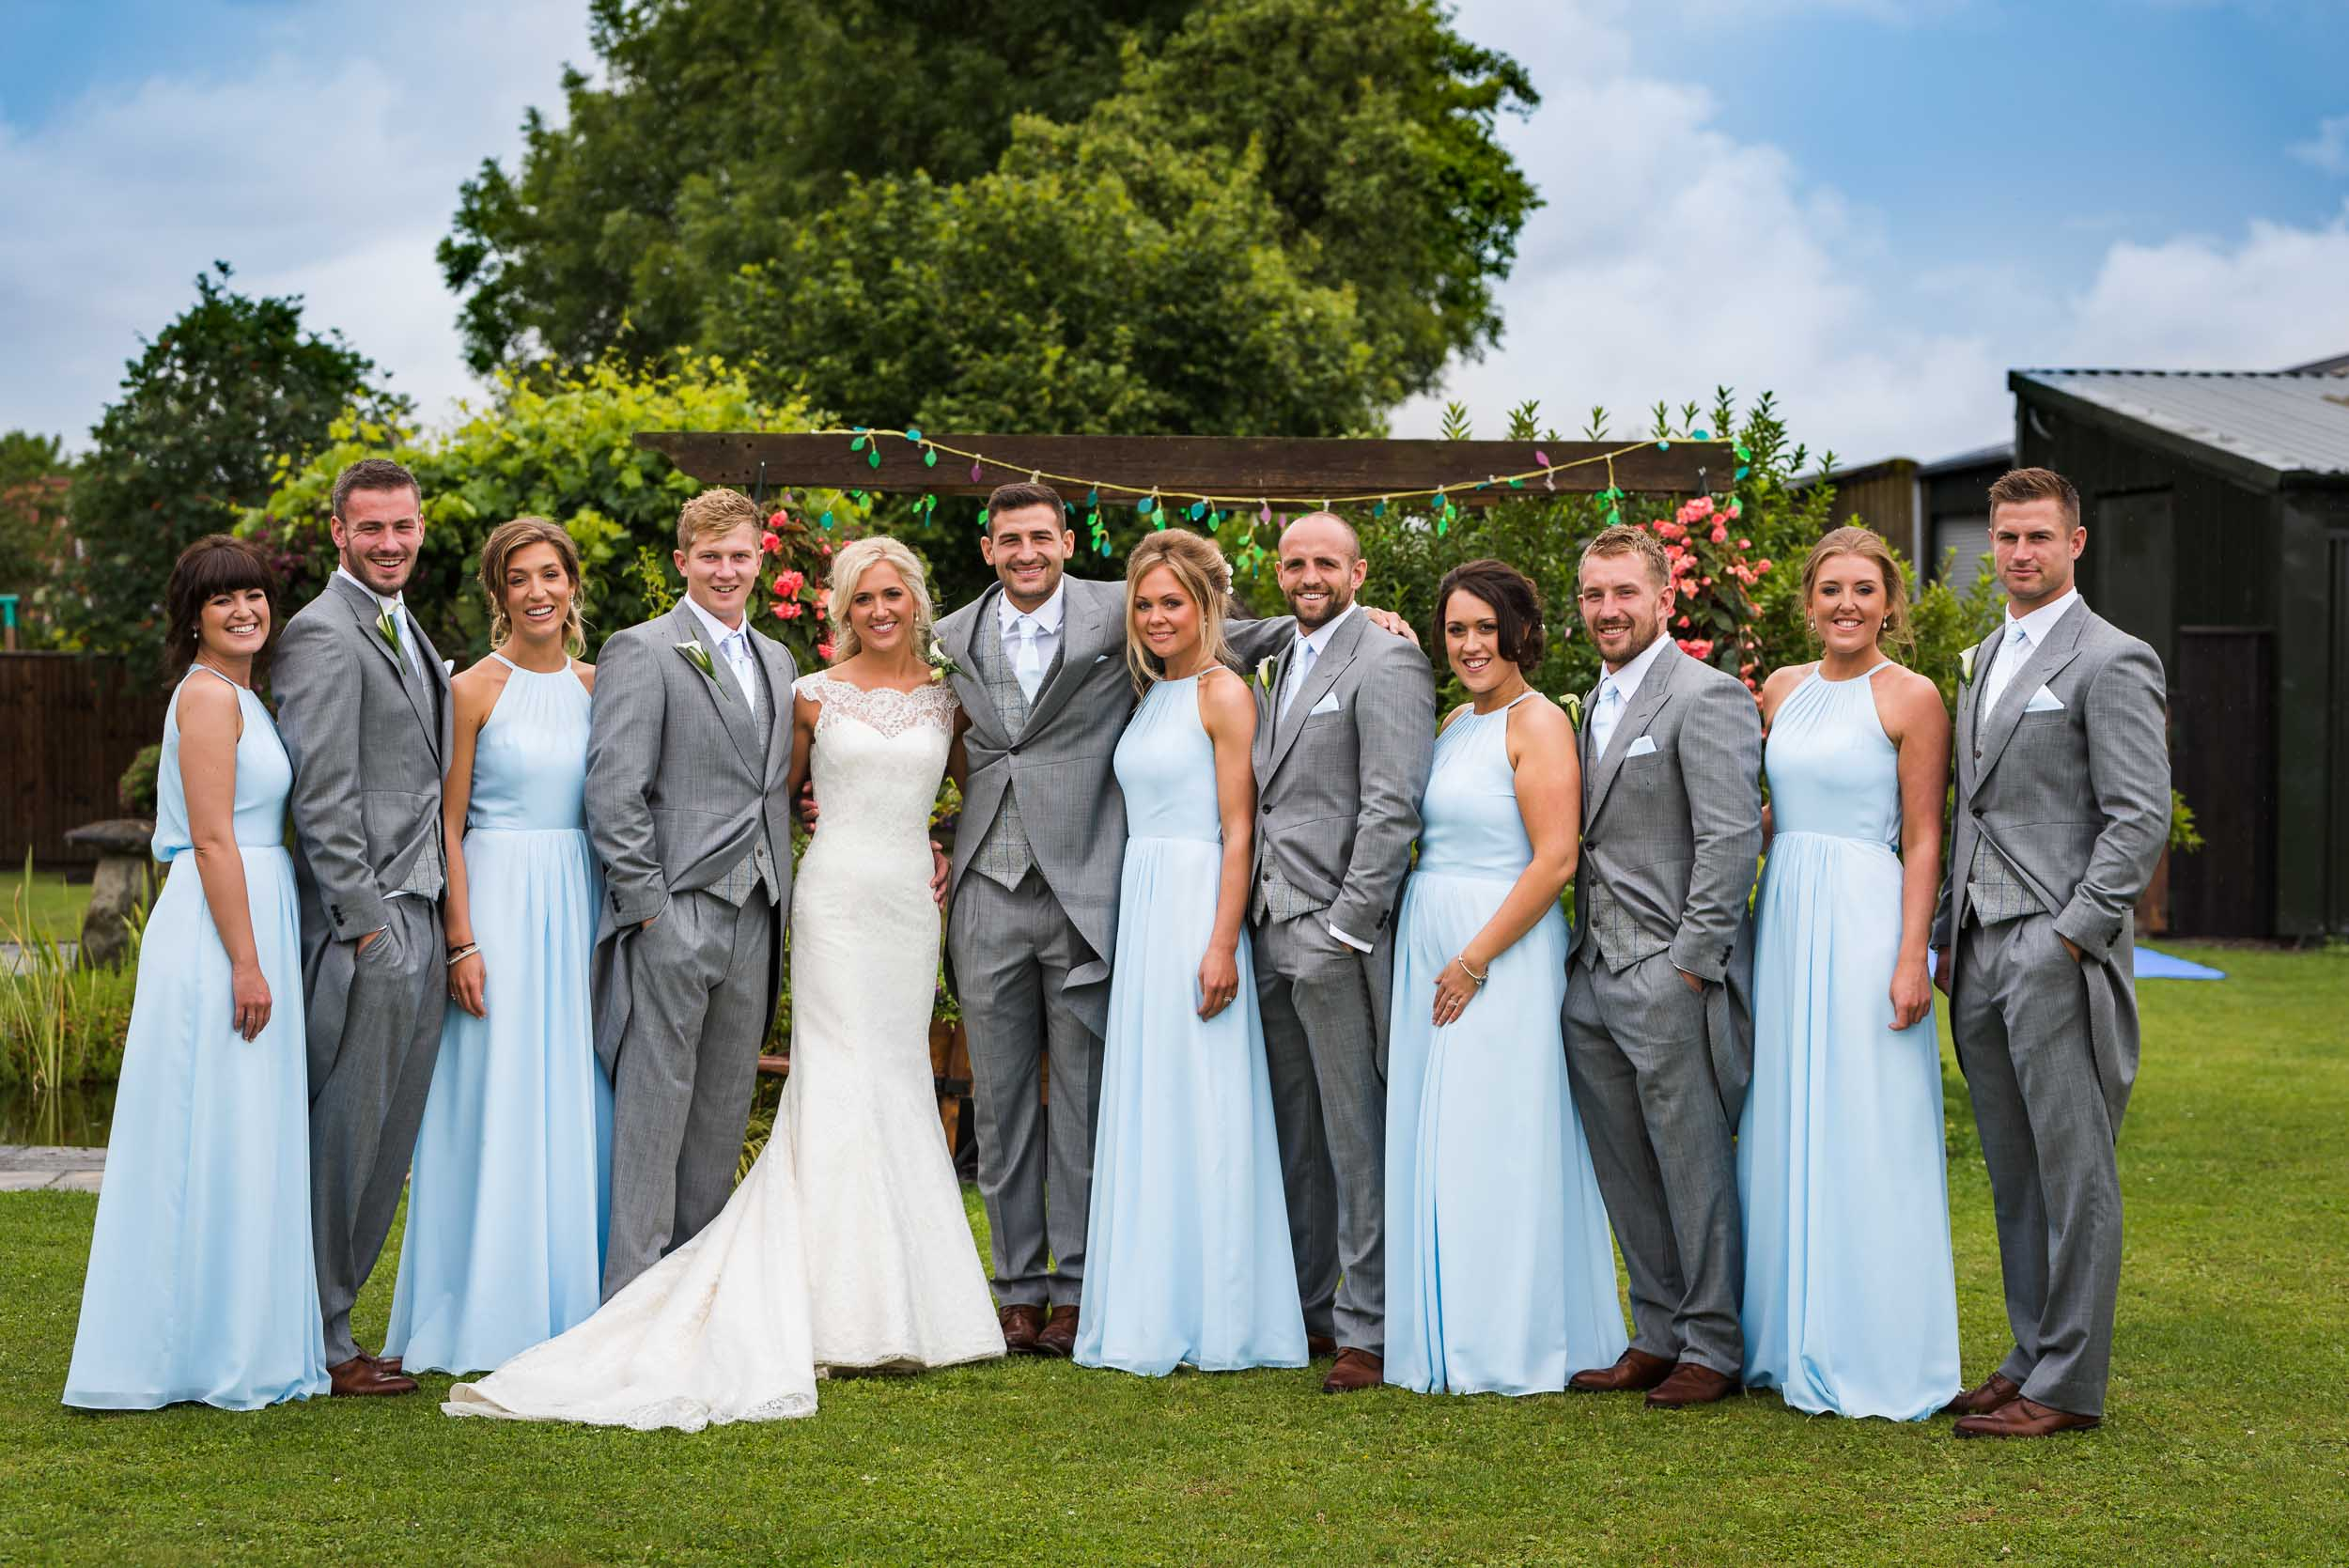 NC-20170722-sophie-and-jonny-wedding-0379.jpg